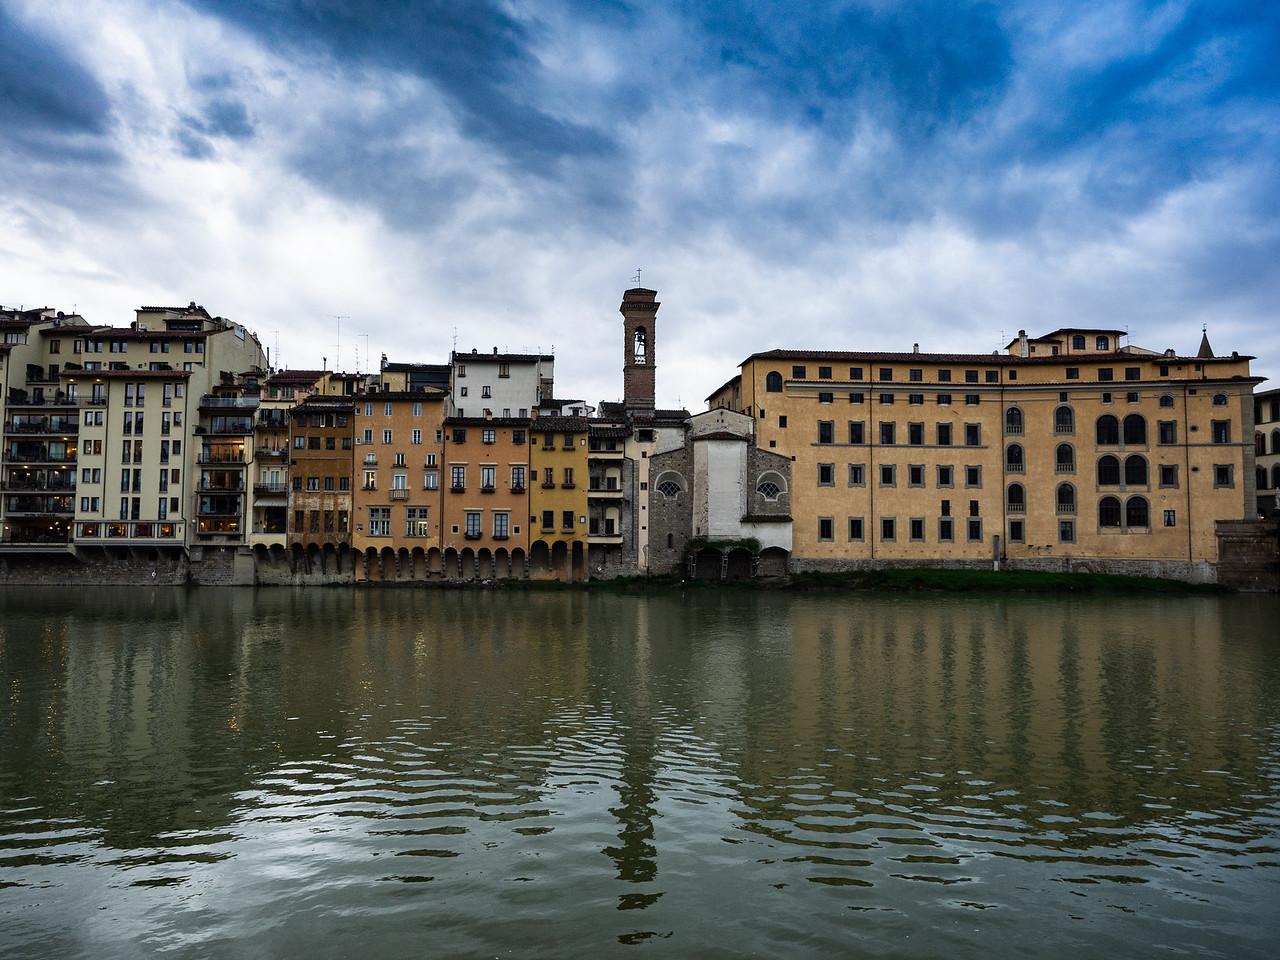 River Arno